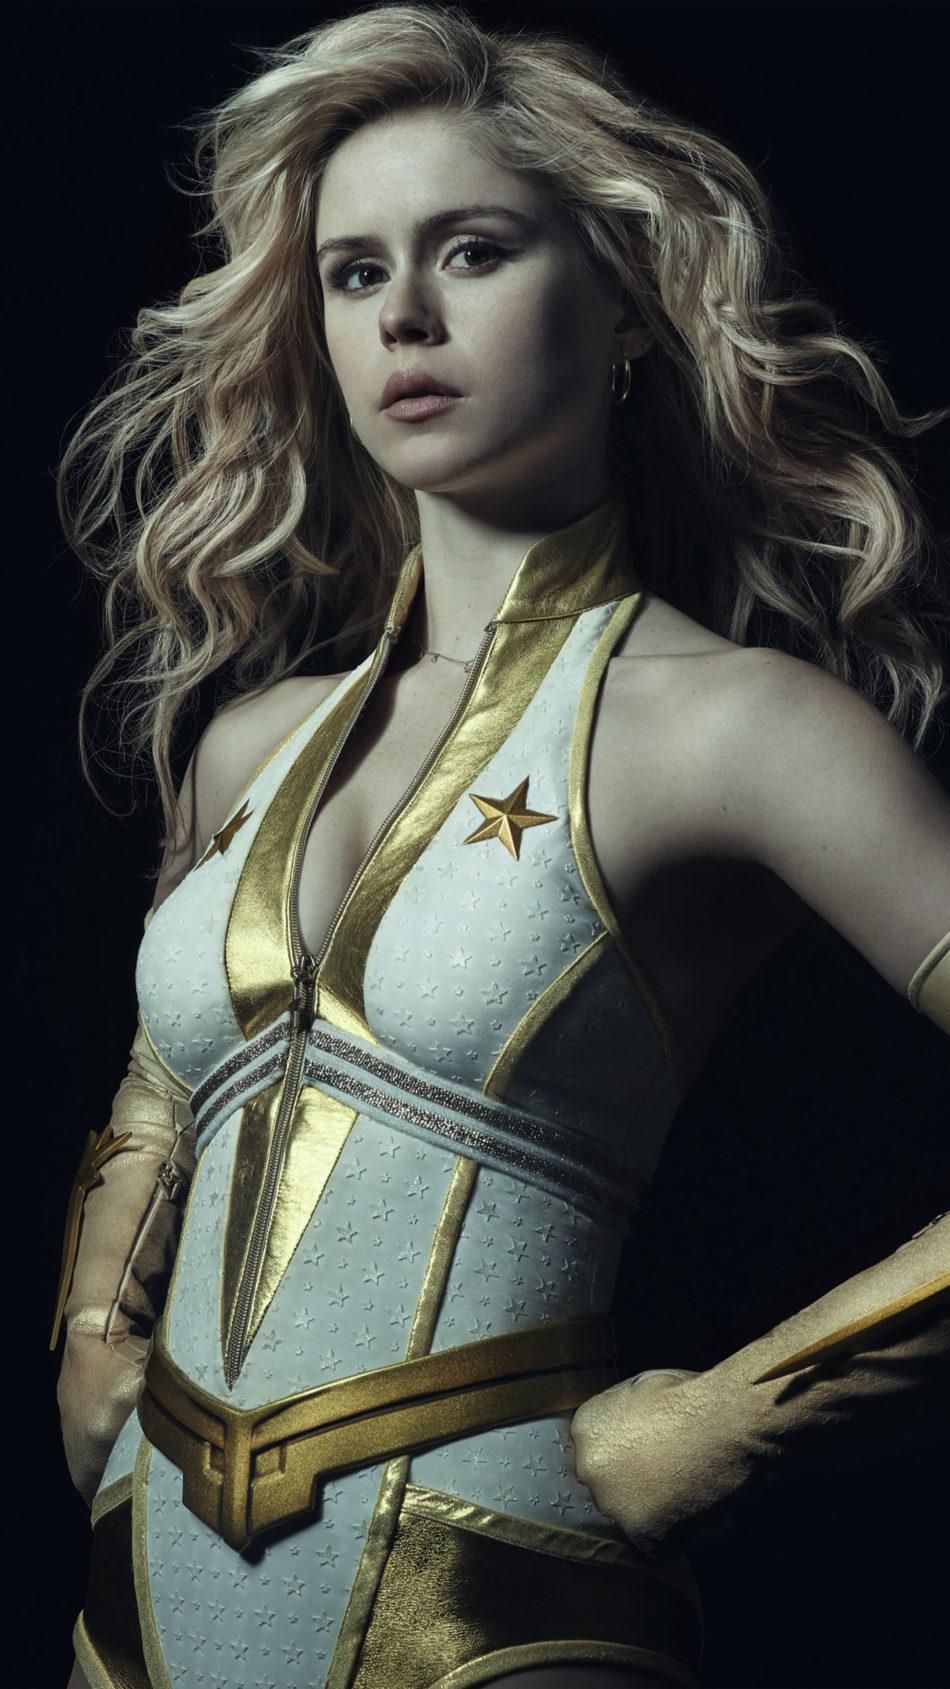 Erin Moriarty As Starlight 4K Ultra HD Mobile Wallpaper